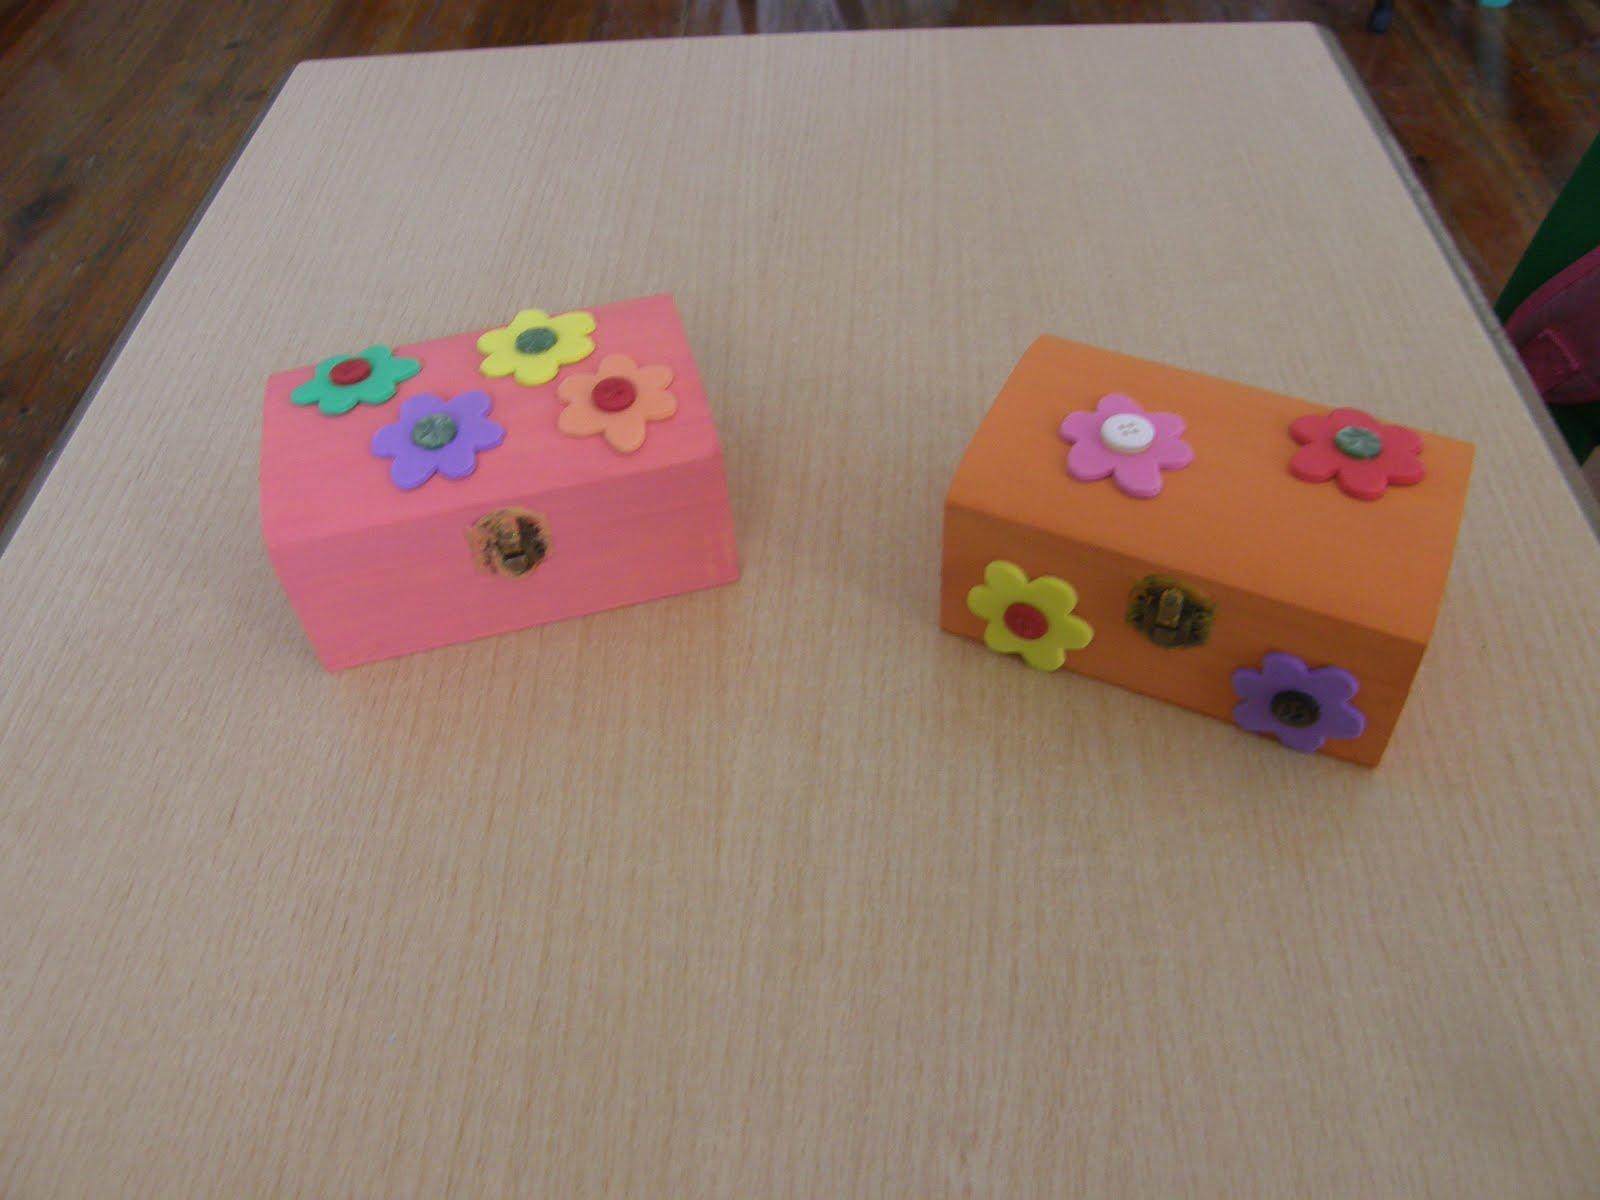 Guarda joias uma caixa de madeira tintas para pintar a caixa papel  #975834 1600x1200